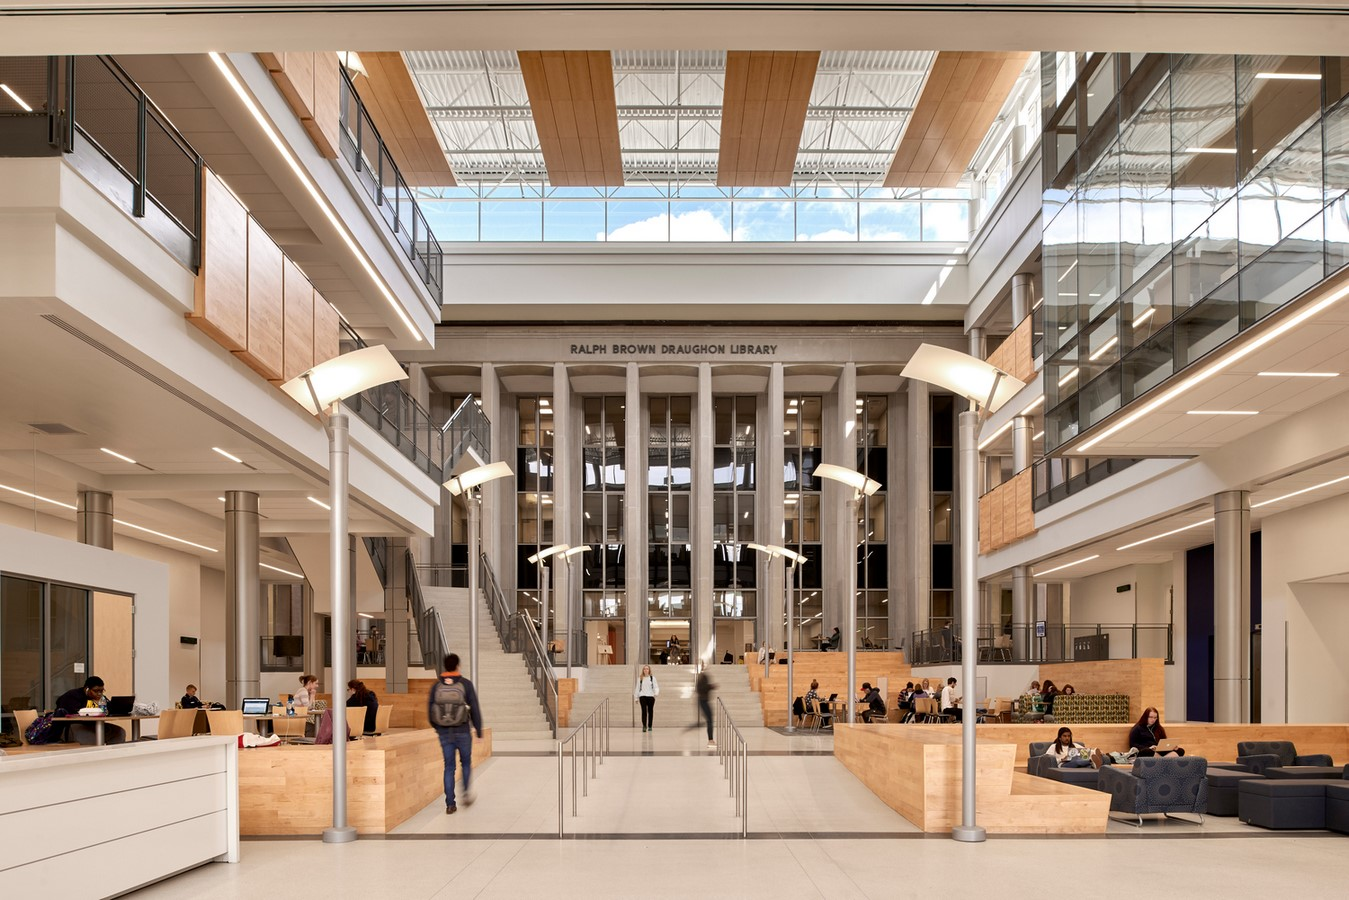 Auburn University - Mell Classroom Building © Rbd Library - Sheet4